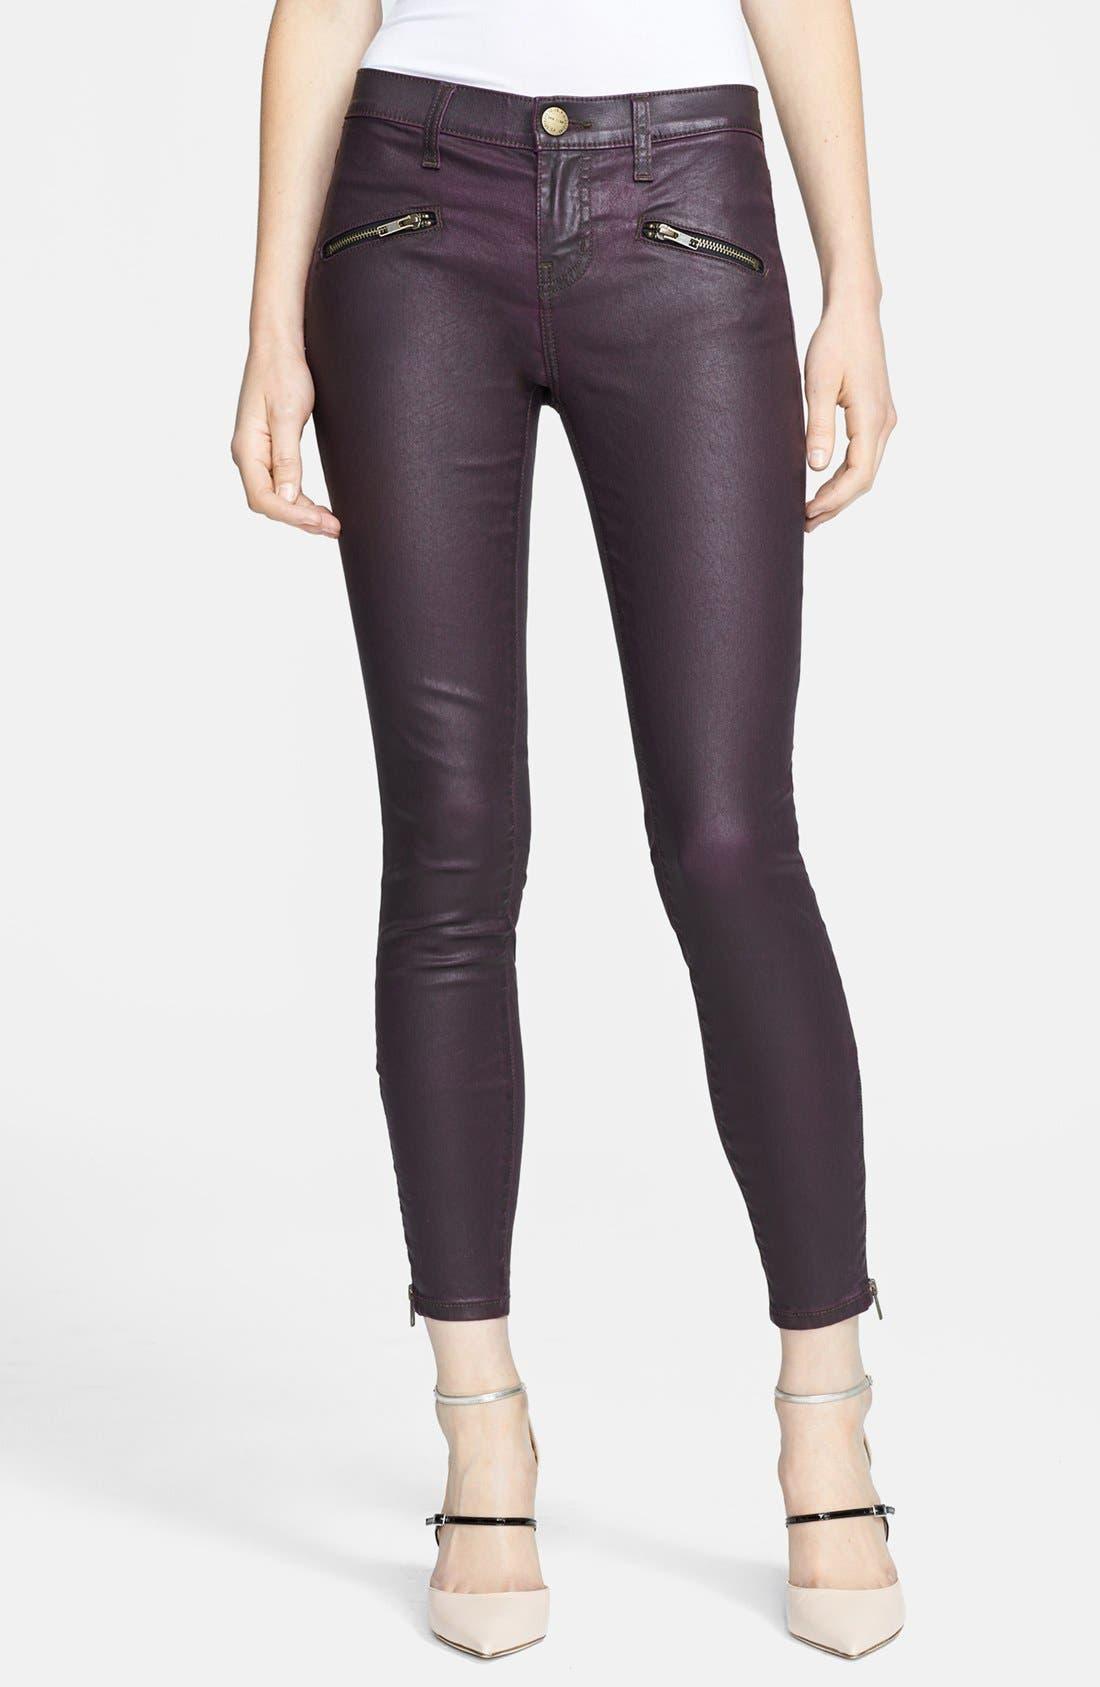 Main Image - Current/Elliott 'The Soho Zip' Skinny Coated Jeans